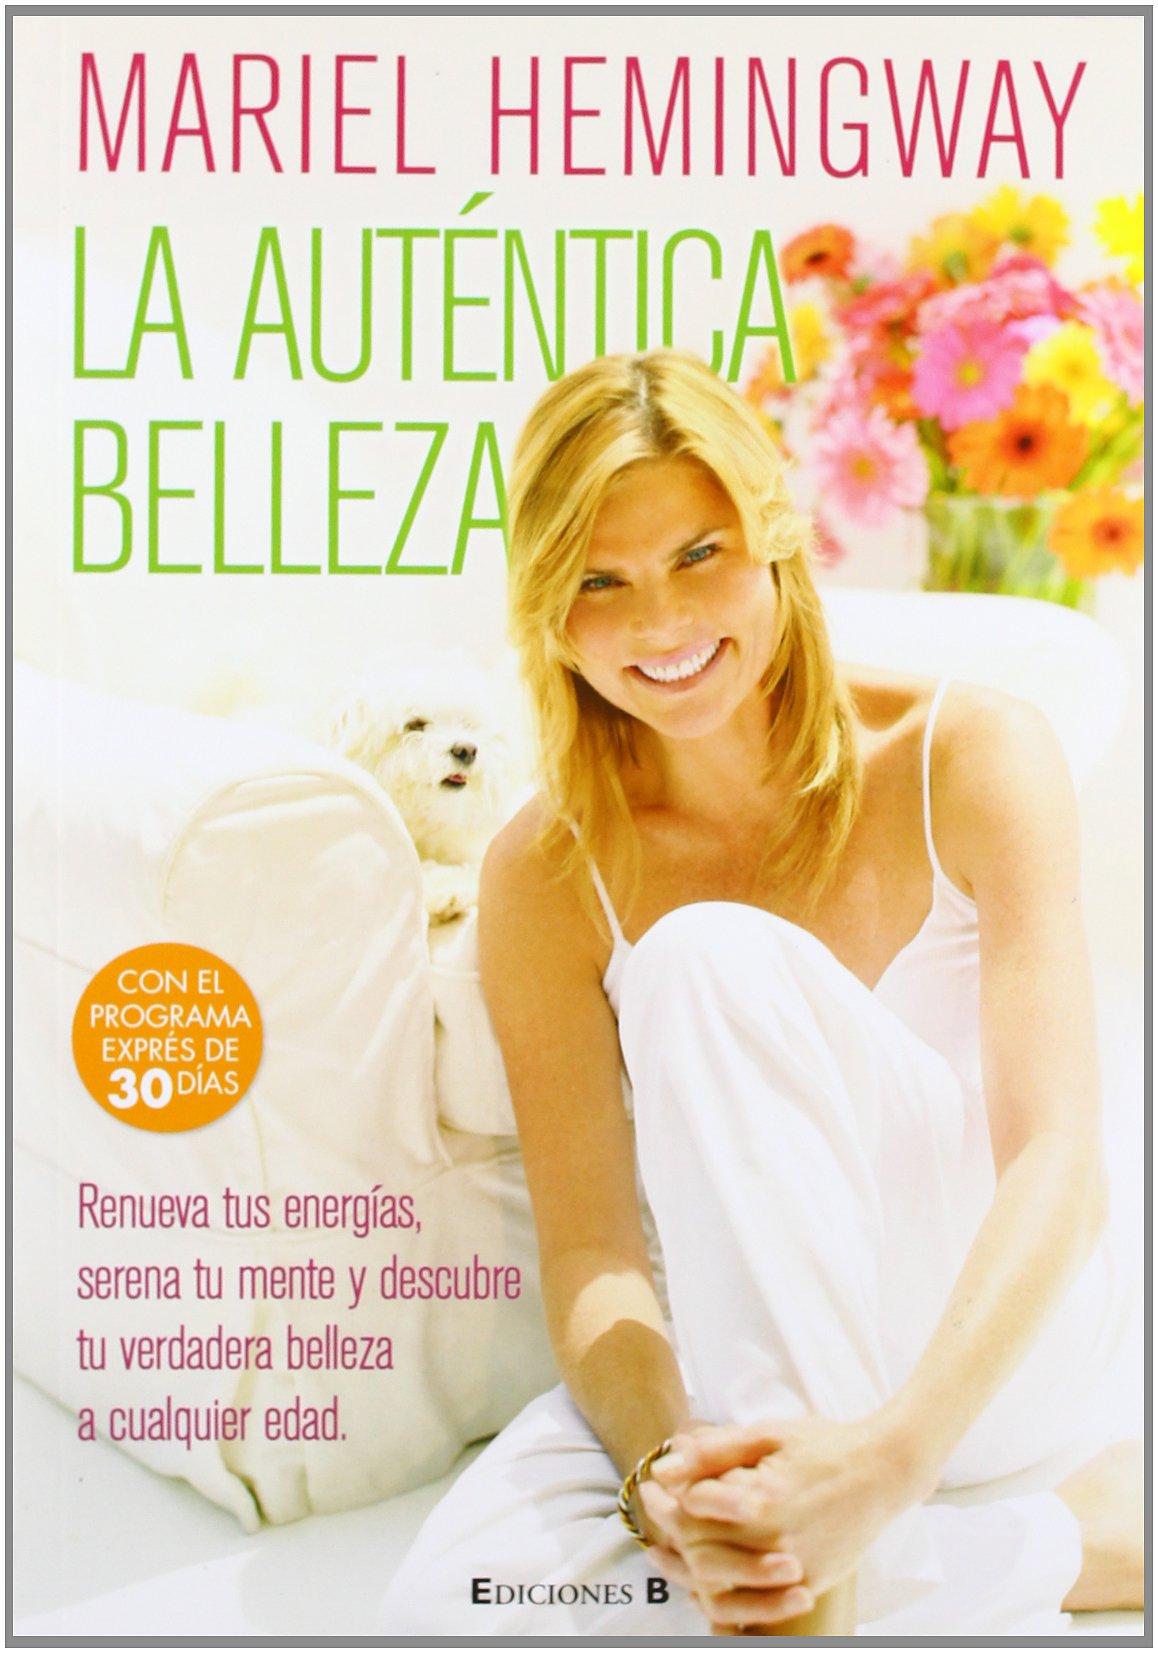 La utentica belleza (Spanish Edition): Mariel Hemingway ...